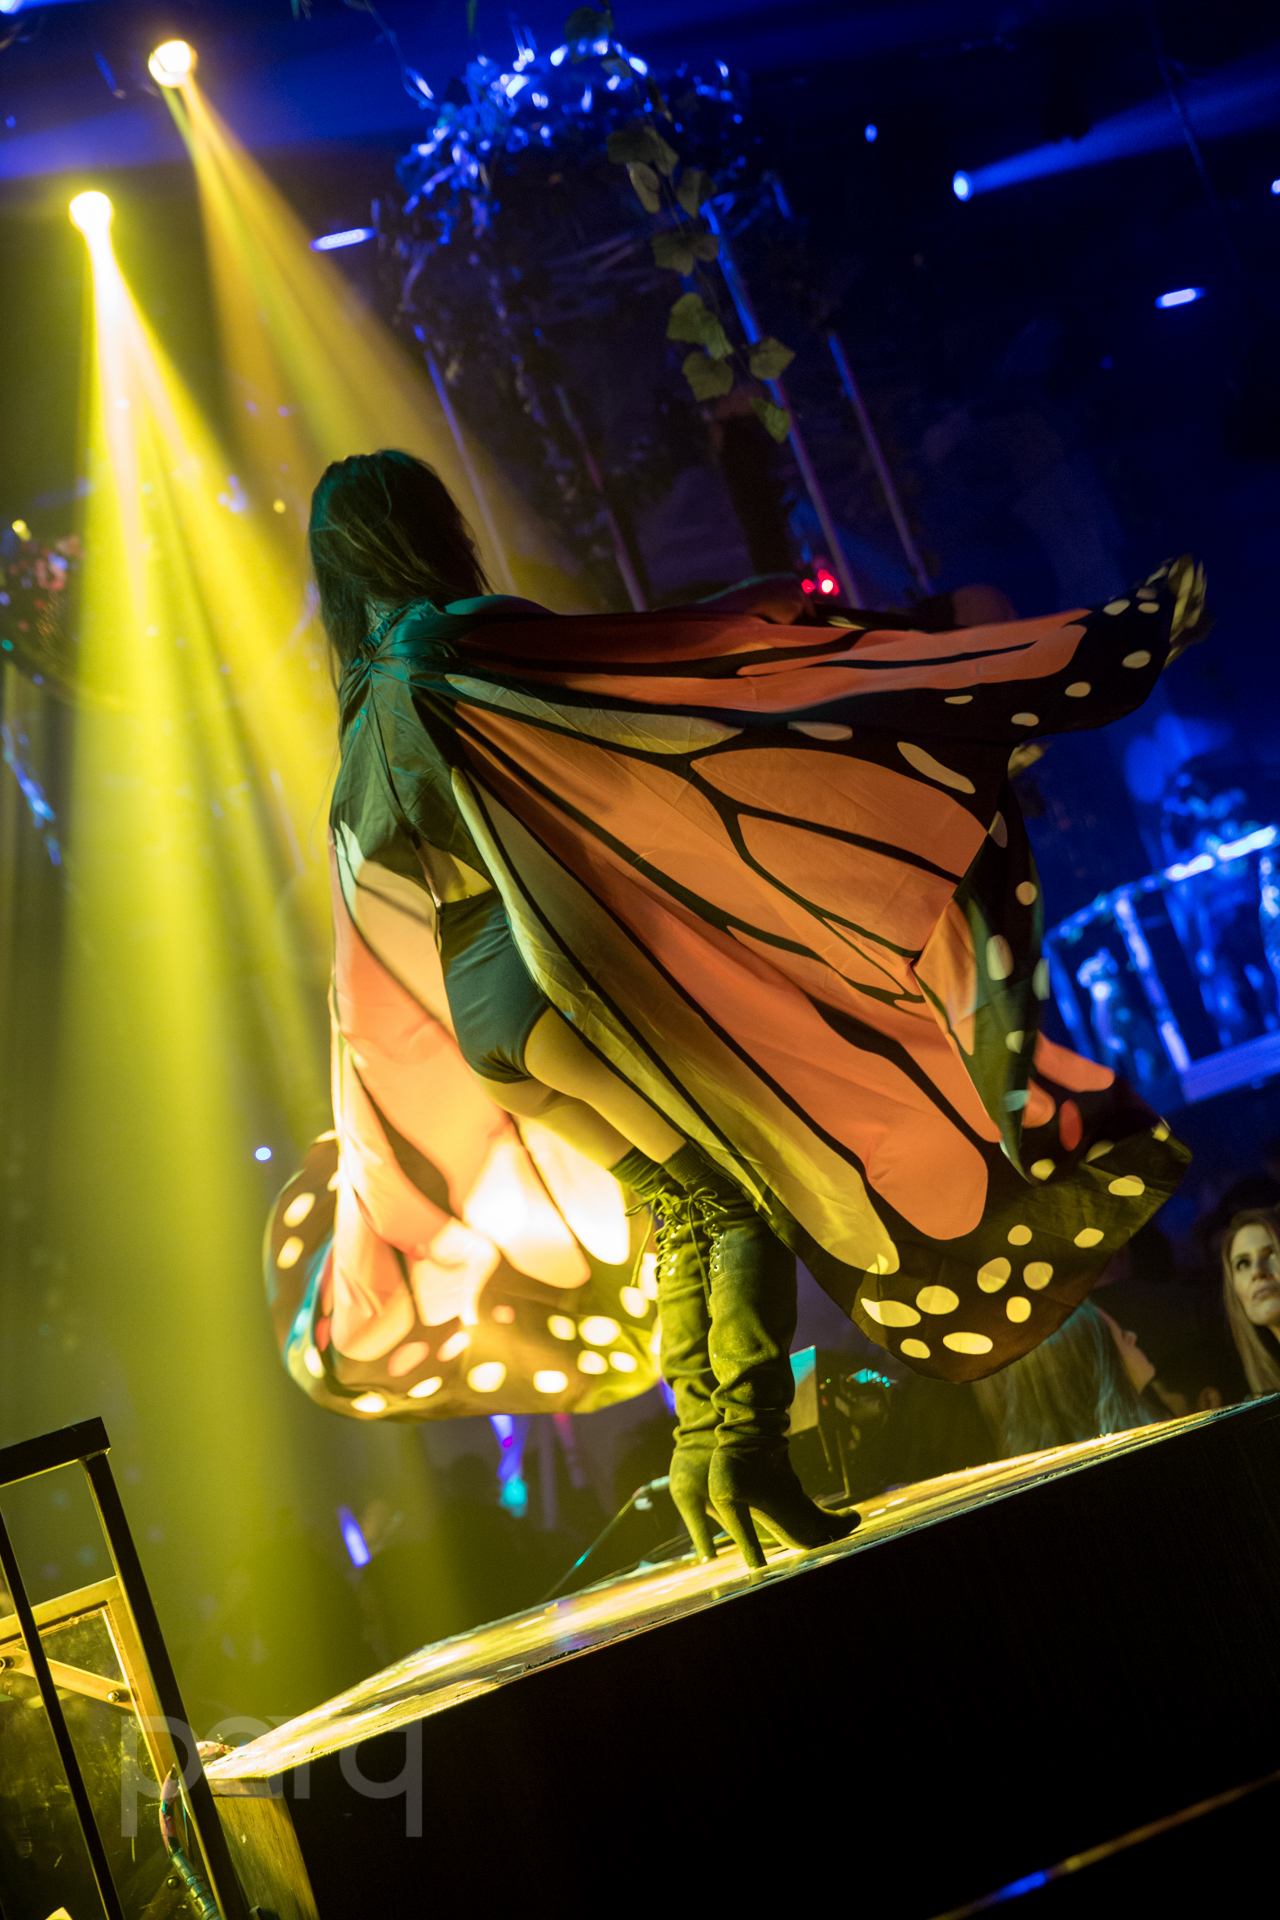 San-Diego-Nightclub-Zoo Funktion-45.jpg